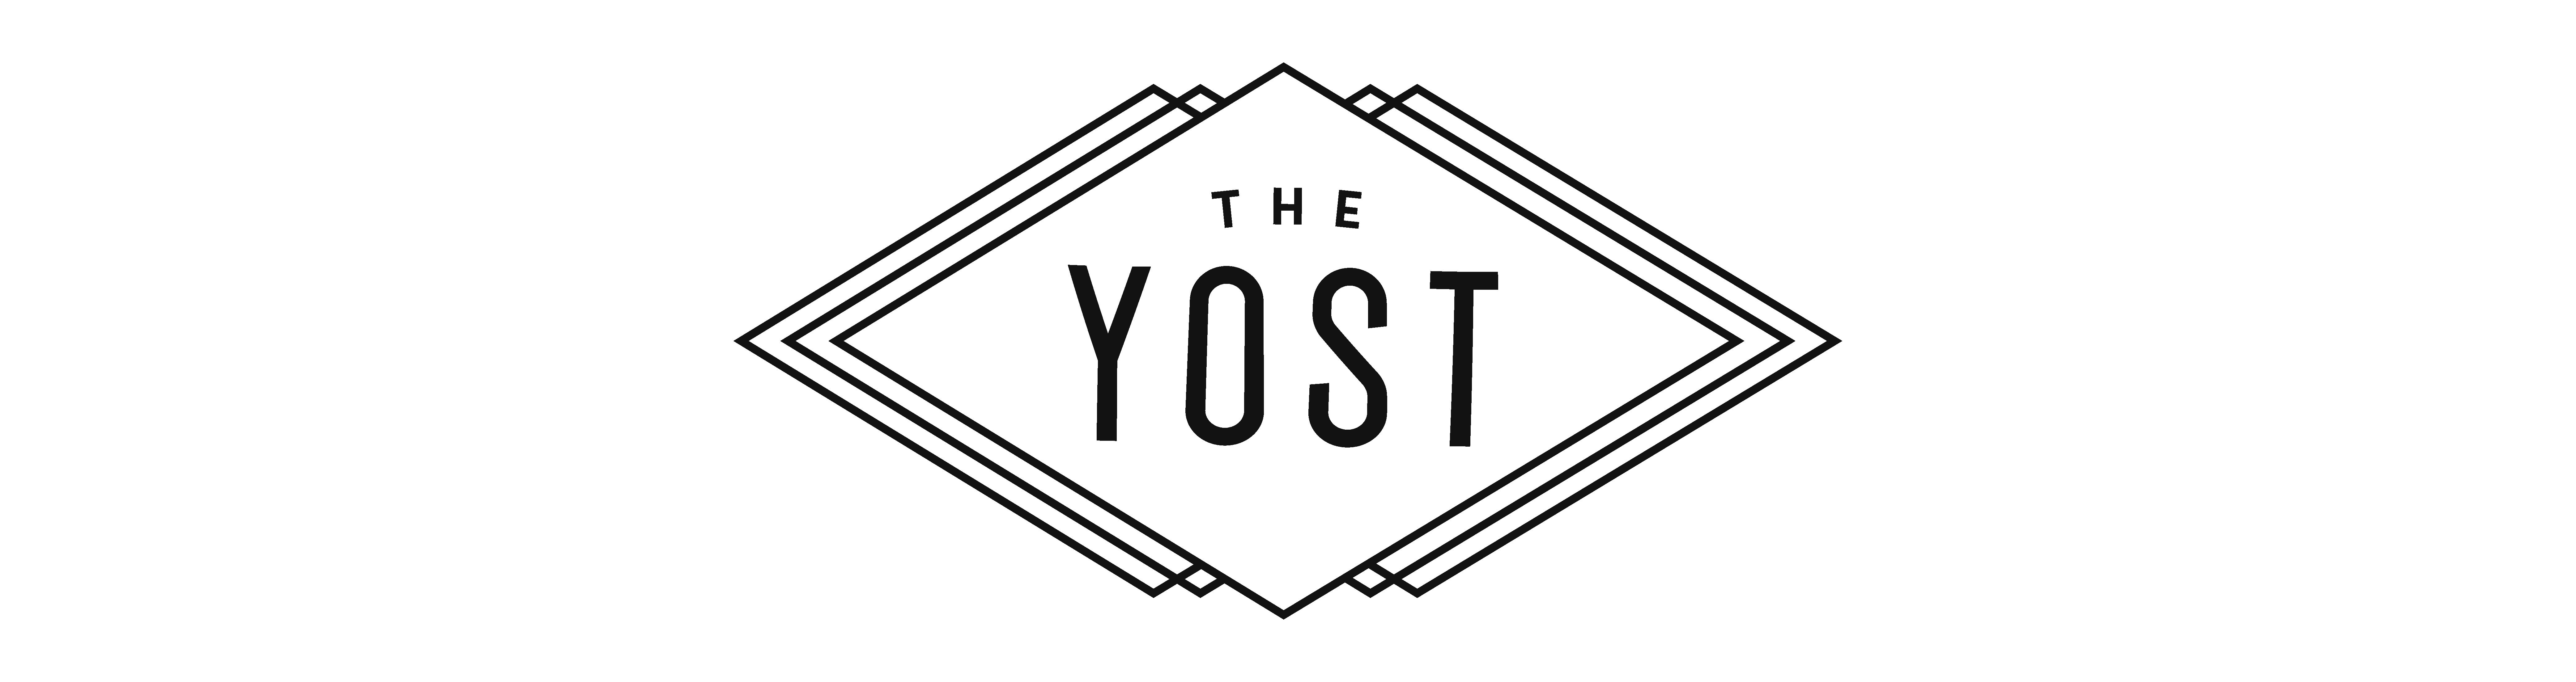 Yost venue logo and brand by Album